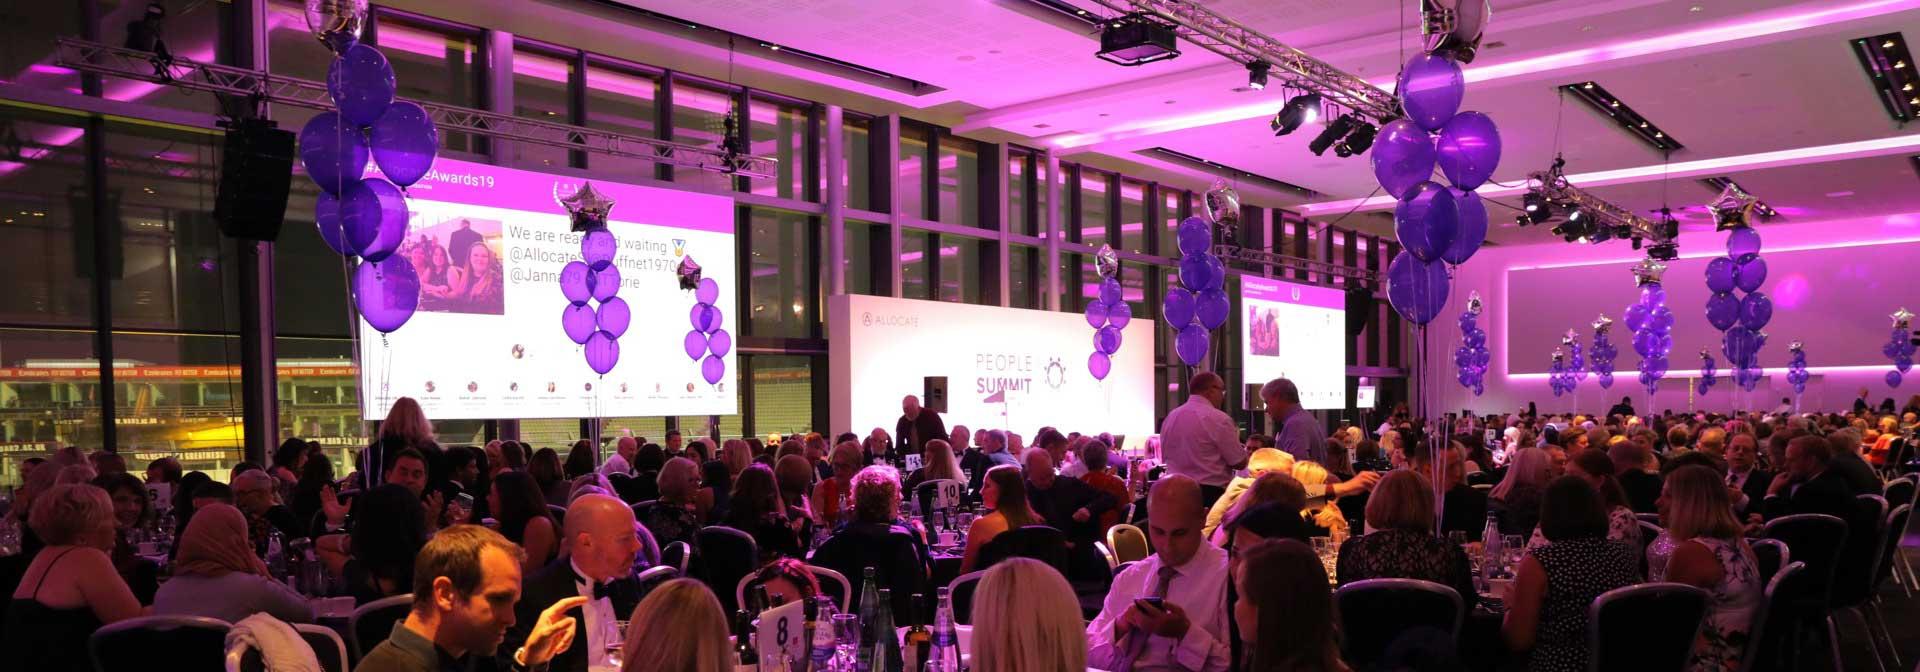 Allocate Celebrates 2019 Award Winners at its inaugural People Summit